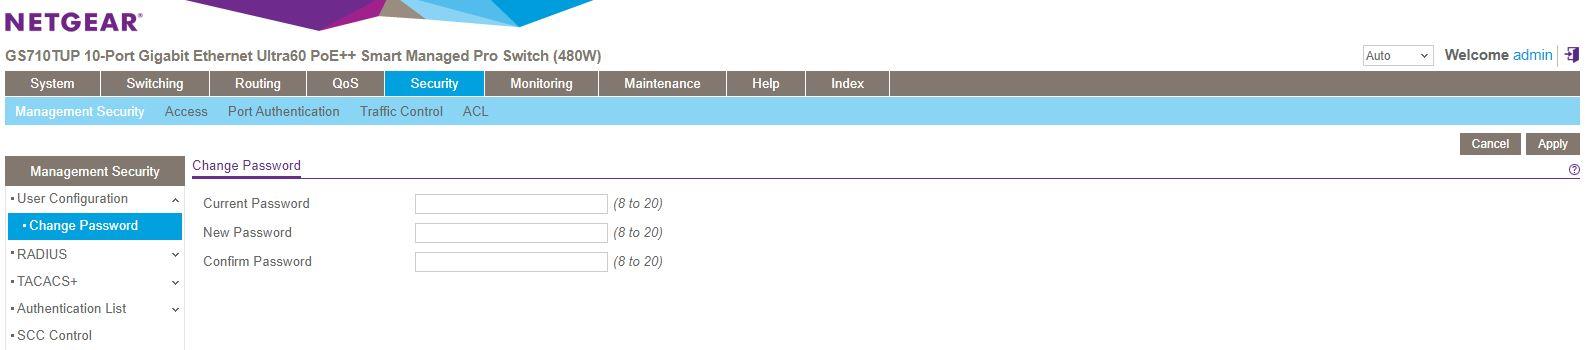 Netgear GS710TUP Insight Management Registered Security Configuration